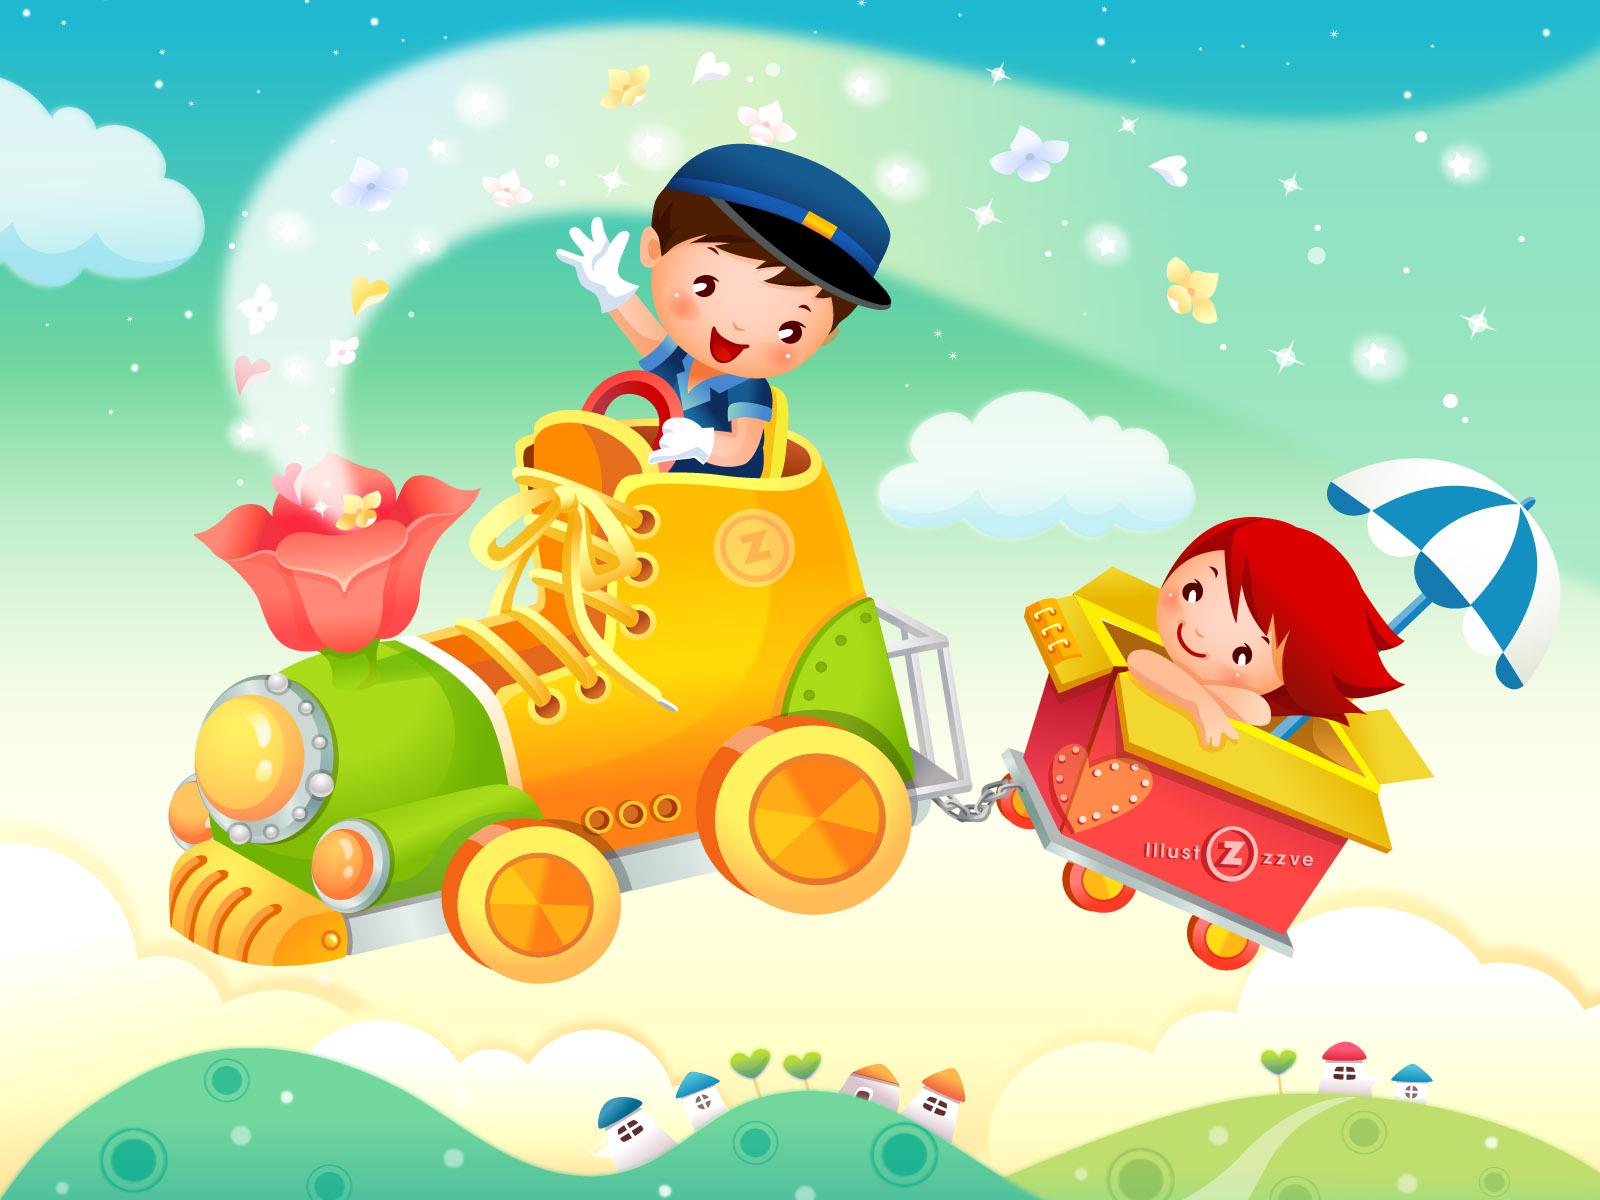 48 children background wallpaper on wallpapersafari - Cartoon boy wallpaper ...